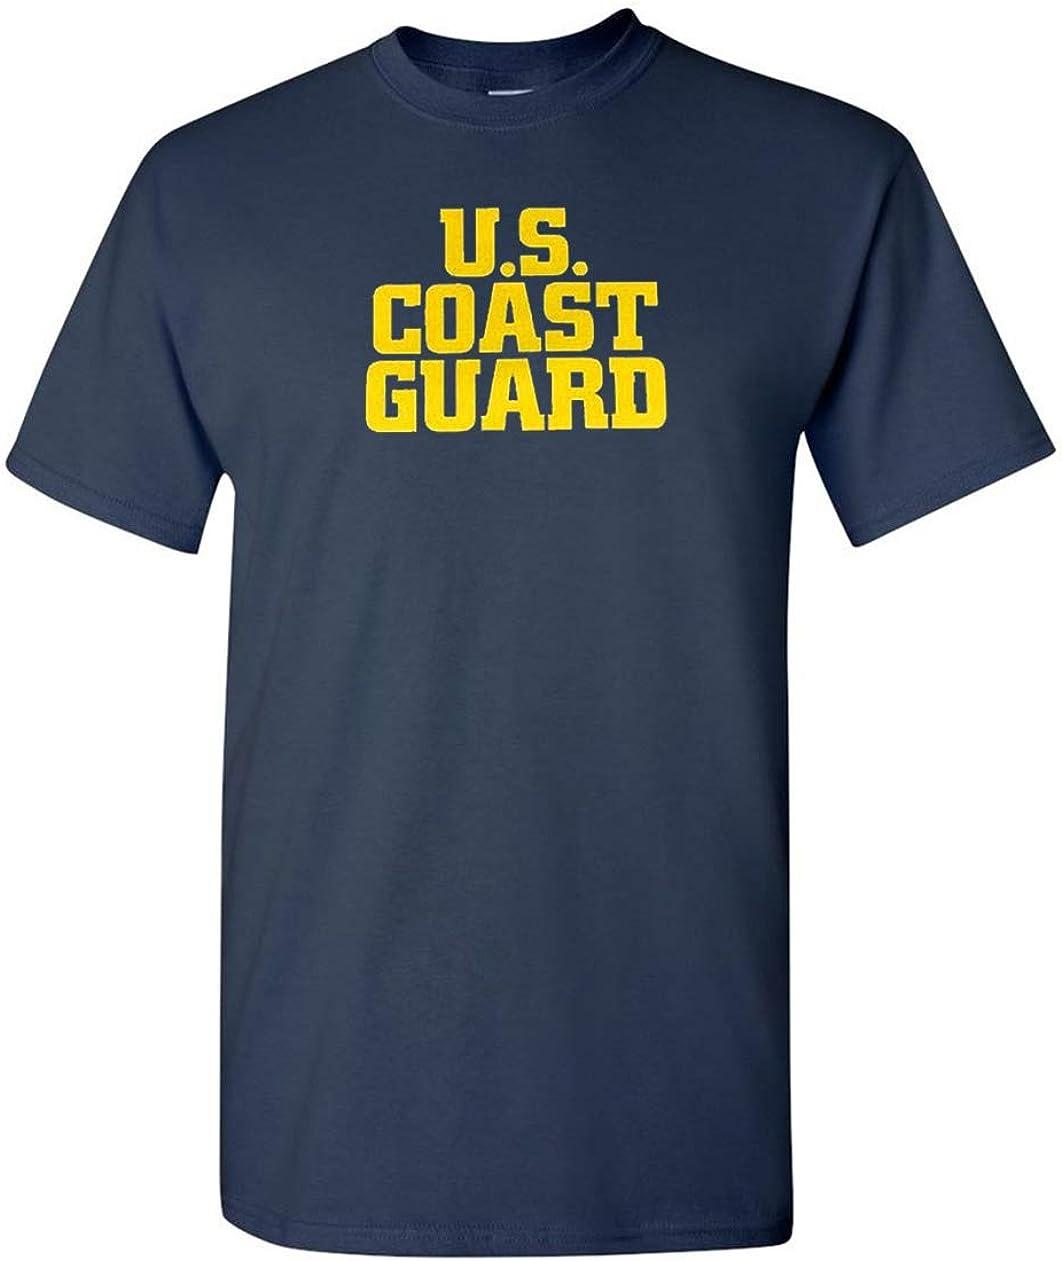 Got-Tee US ejército Militar Nos Costa Guardia Camiseta - Azul ...